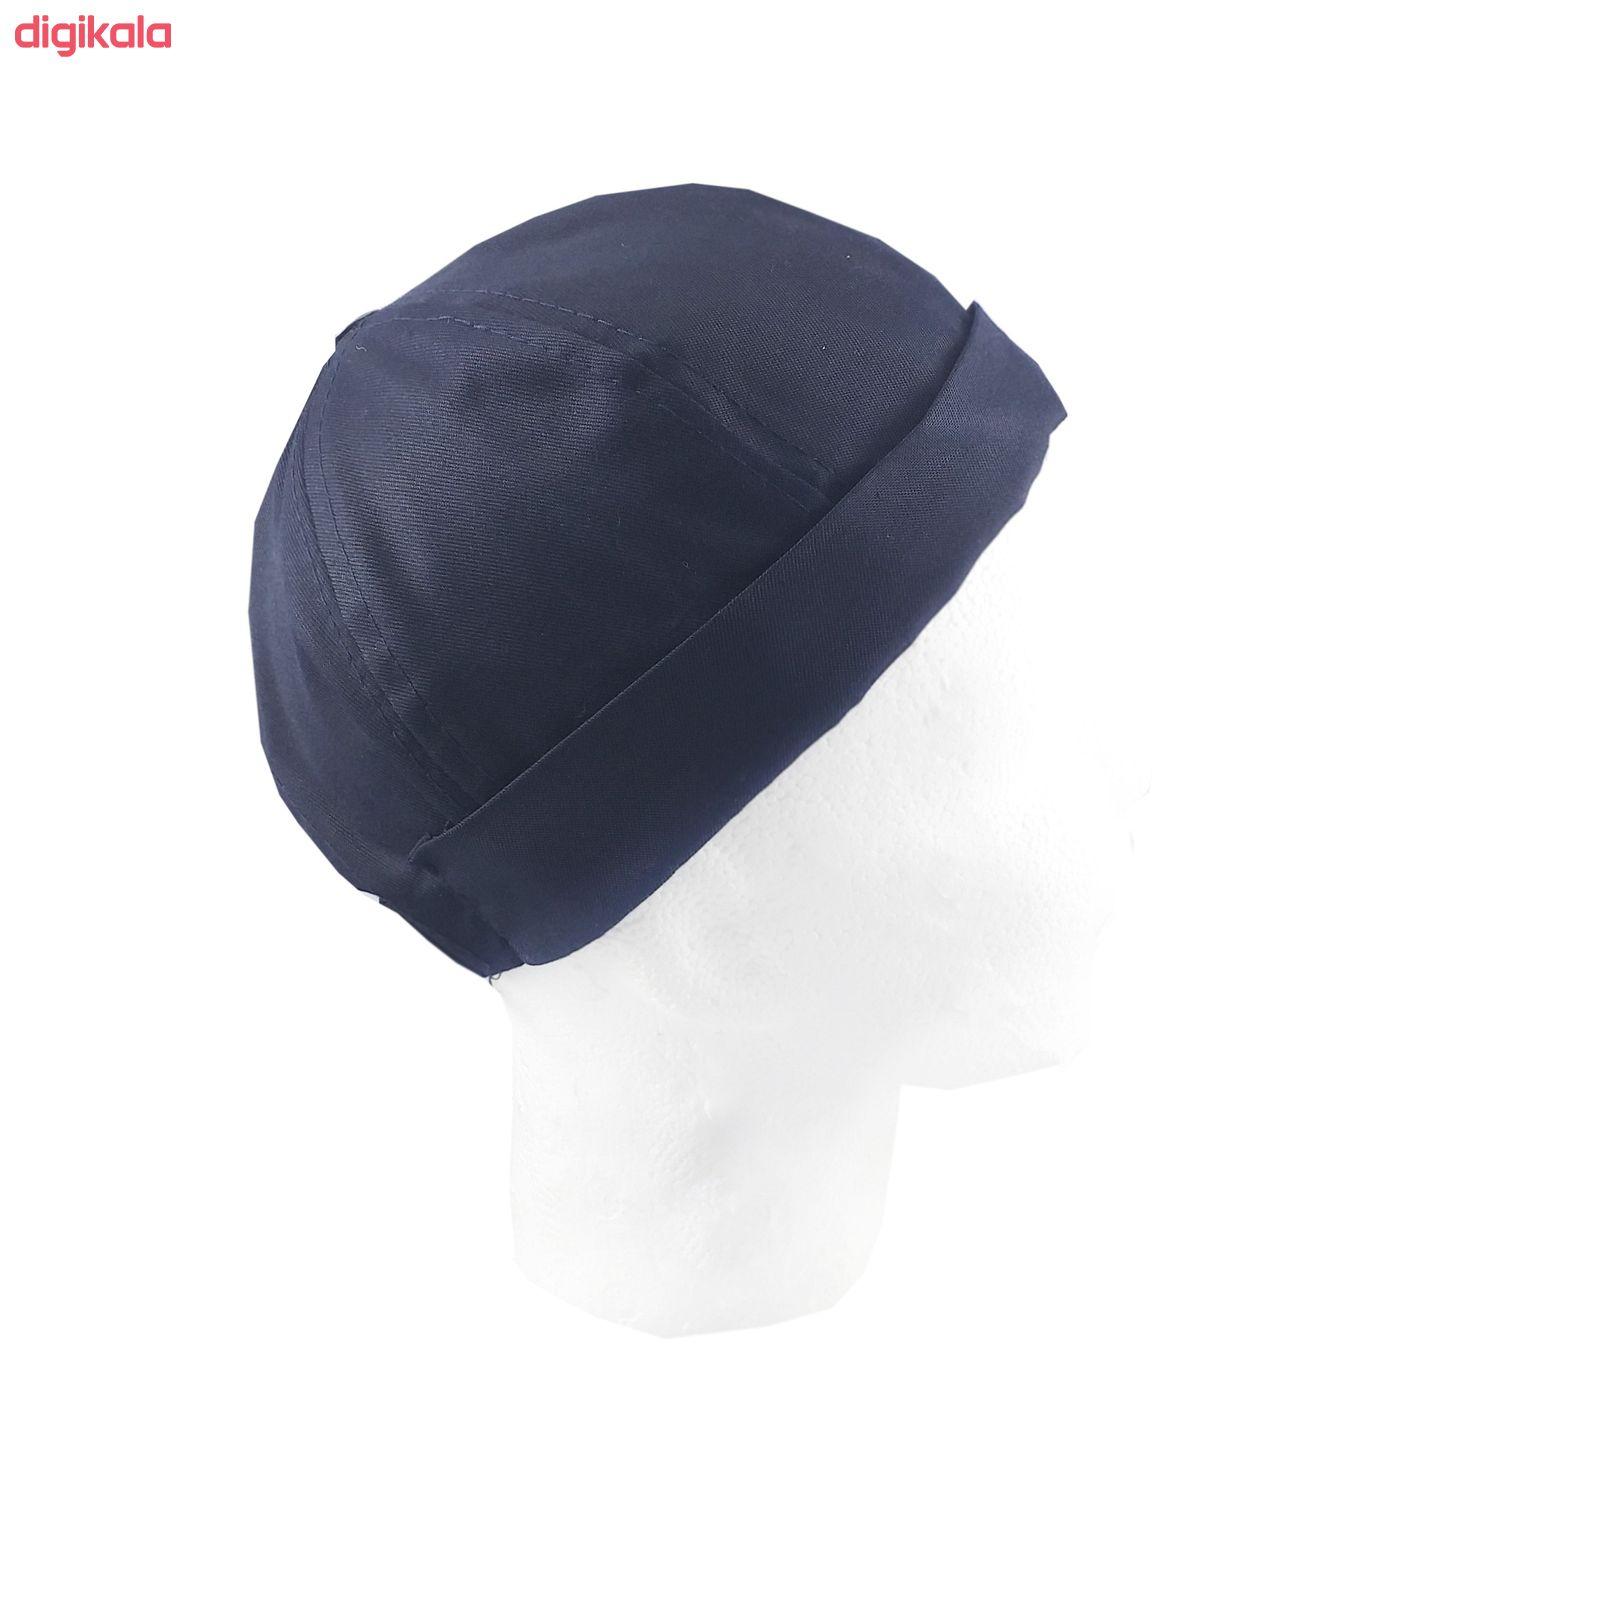 کلاه لئونی مردانه مدل BSOR77 main 1 4